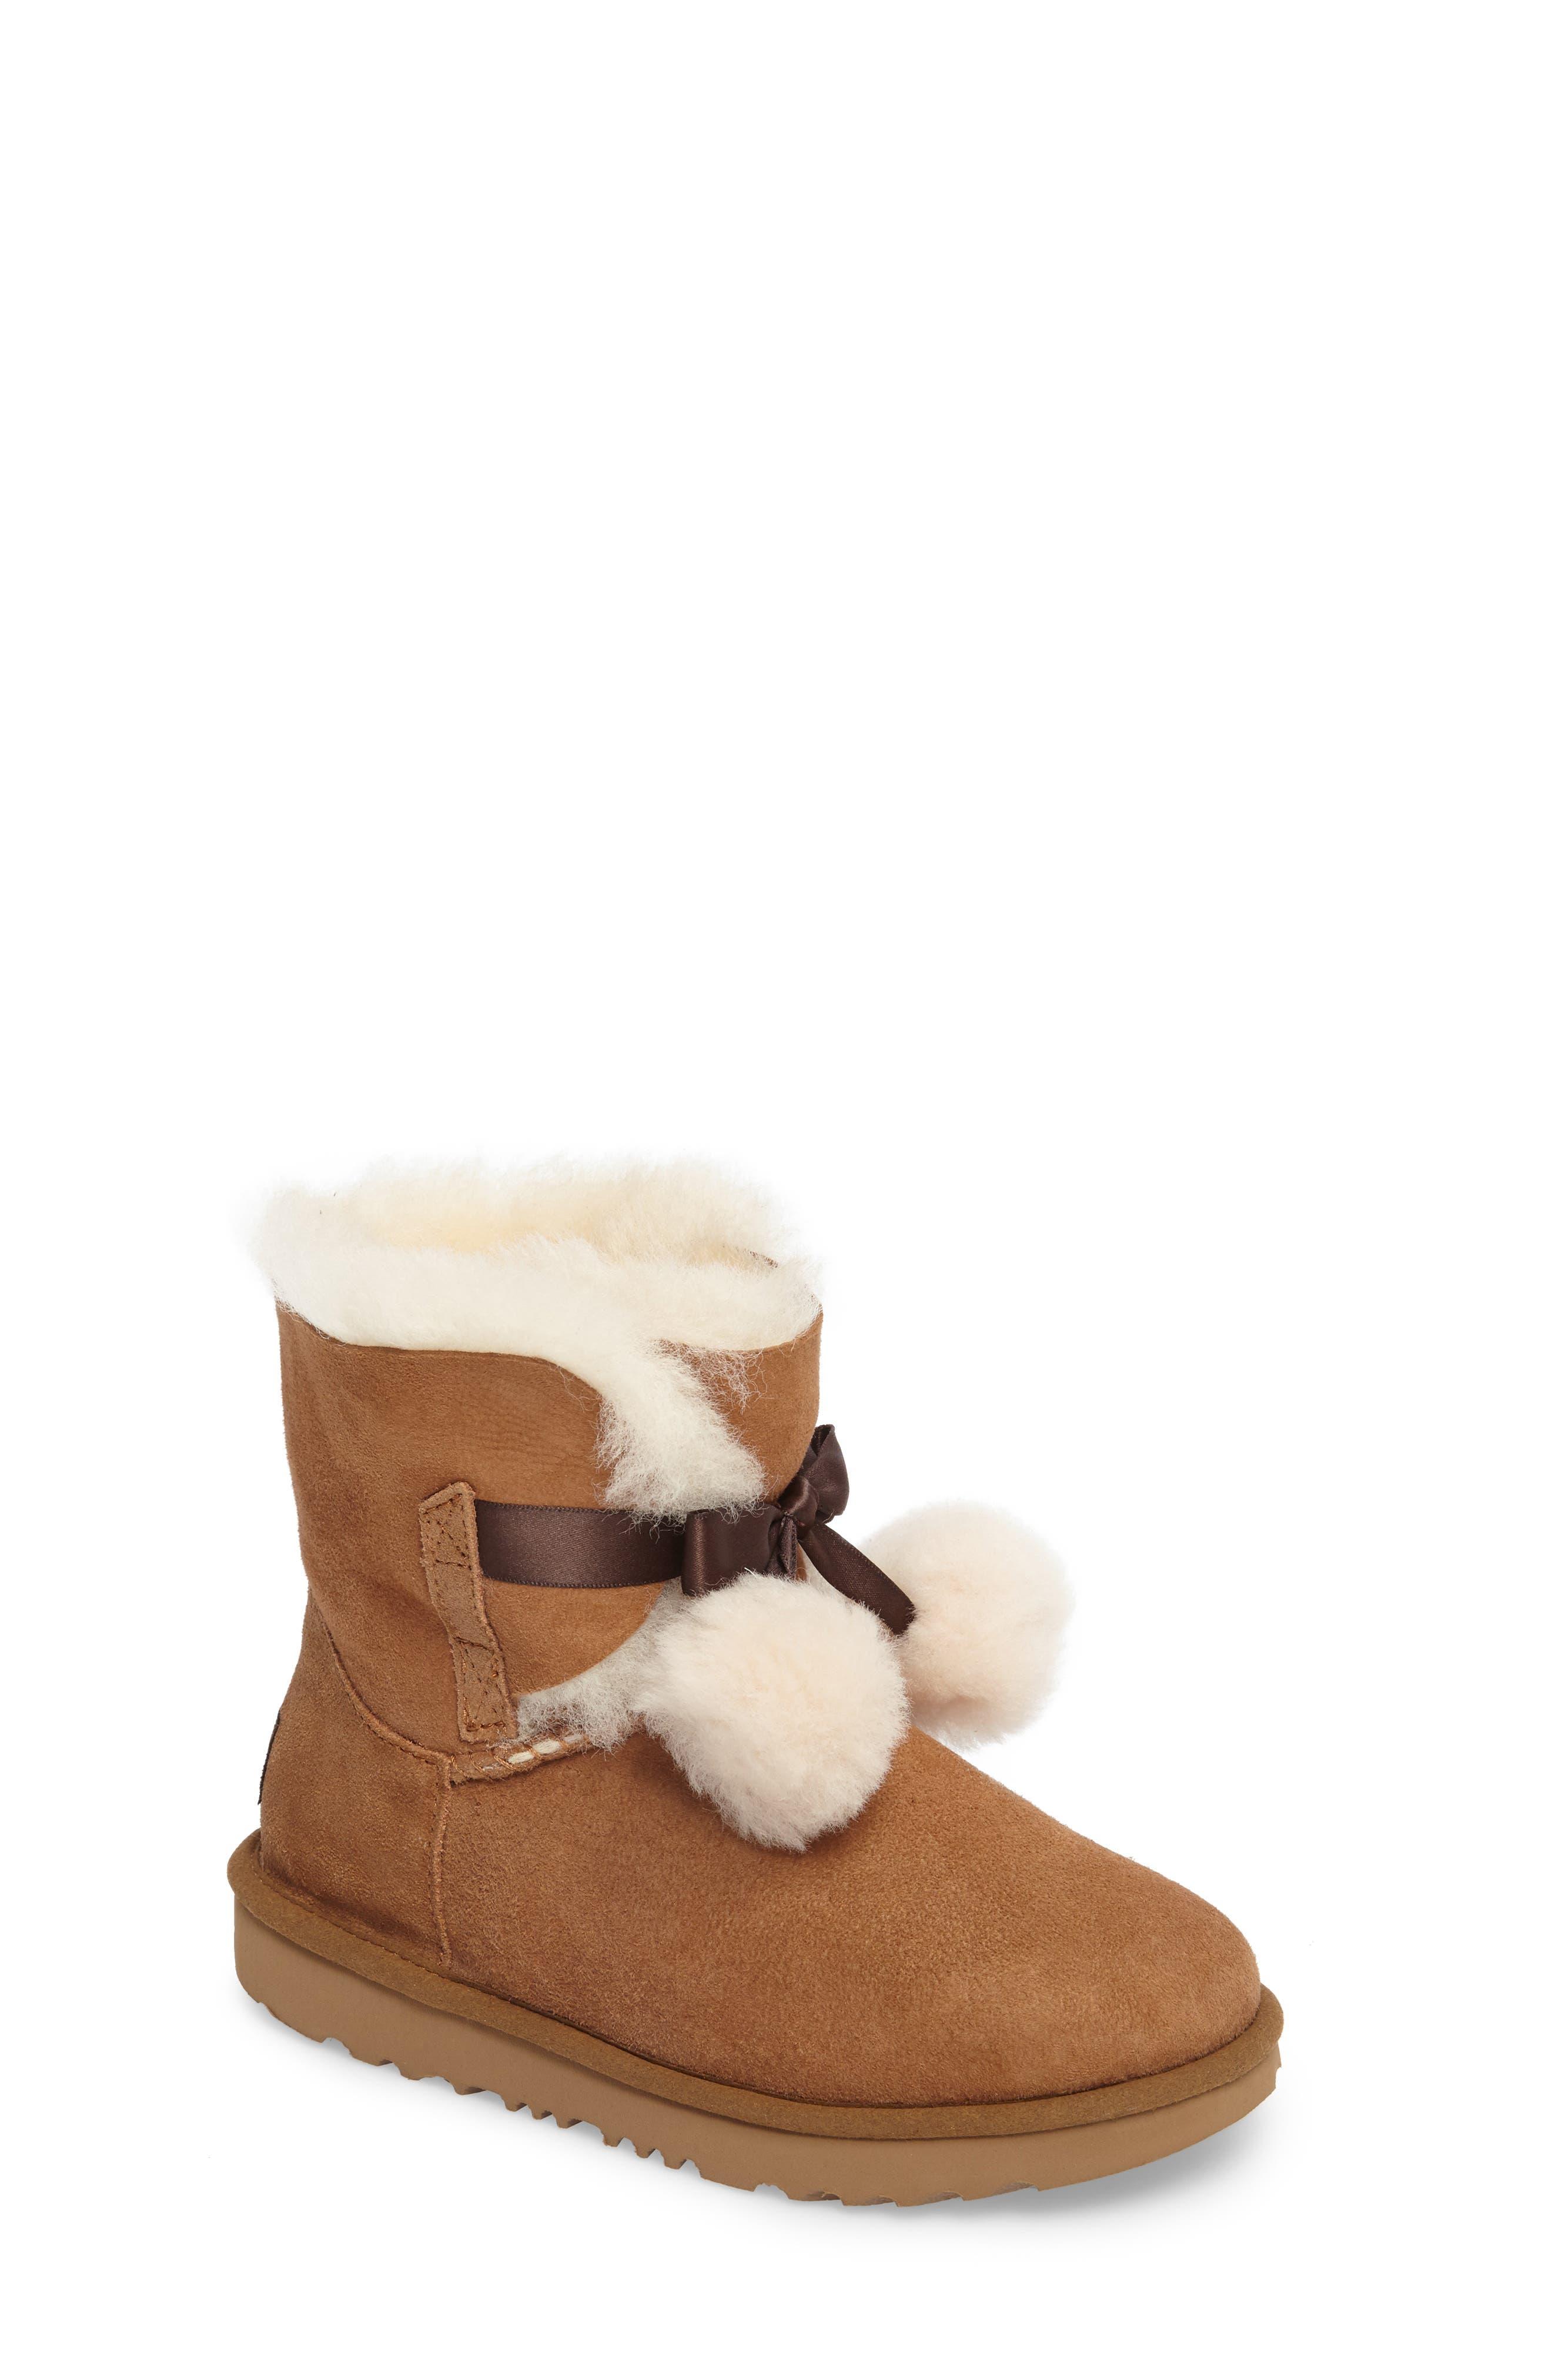 Gita Water-Resistant Genuine Shearling Pom Boot,                         Main,                         color, CHESTNUT